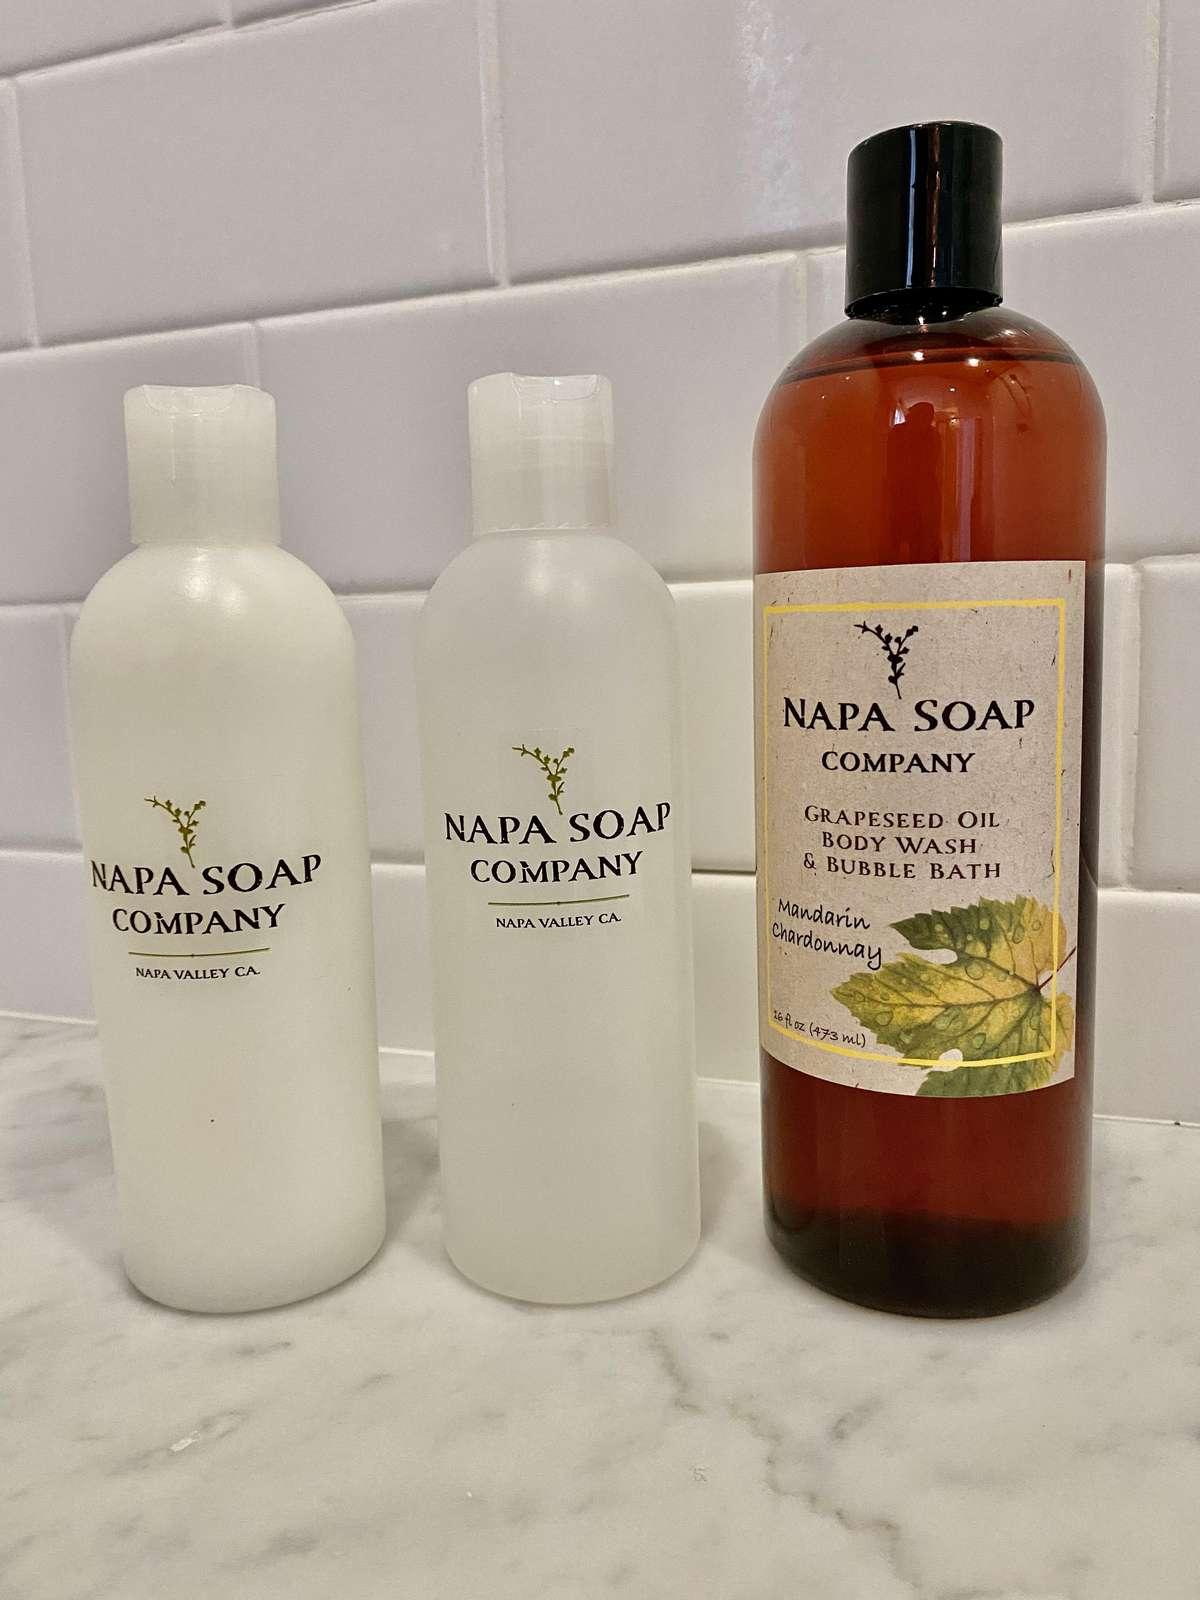 Napa Soap Company amenities in all bathrooms